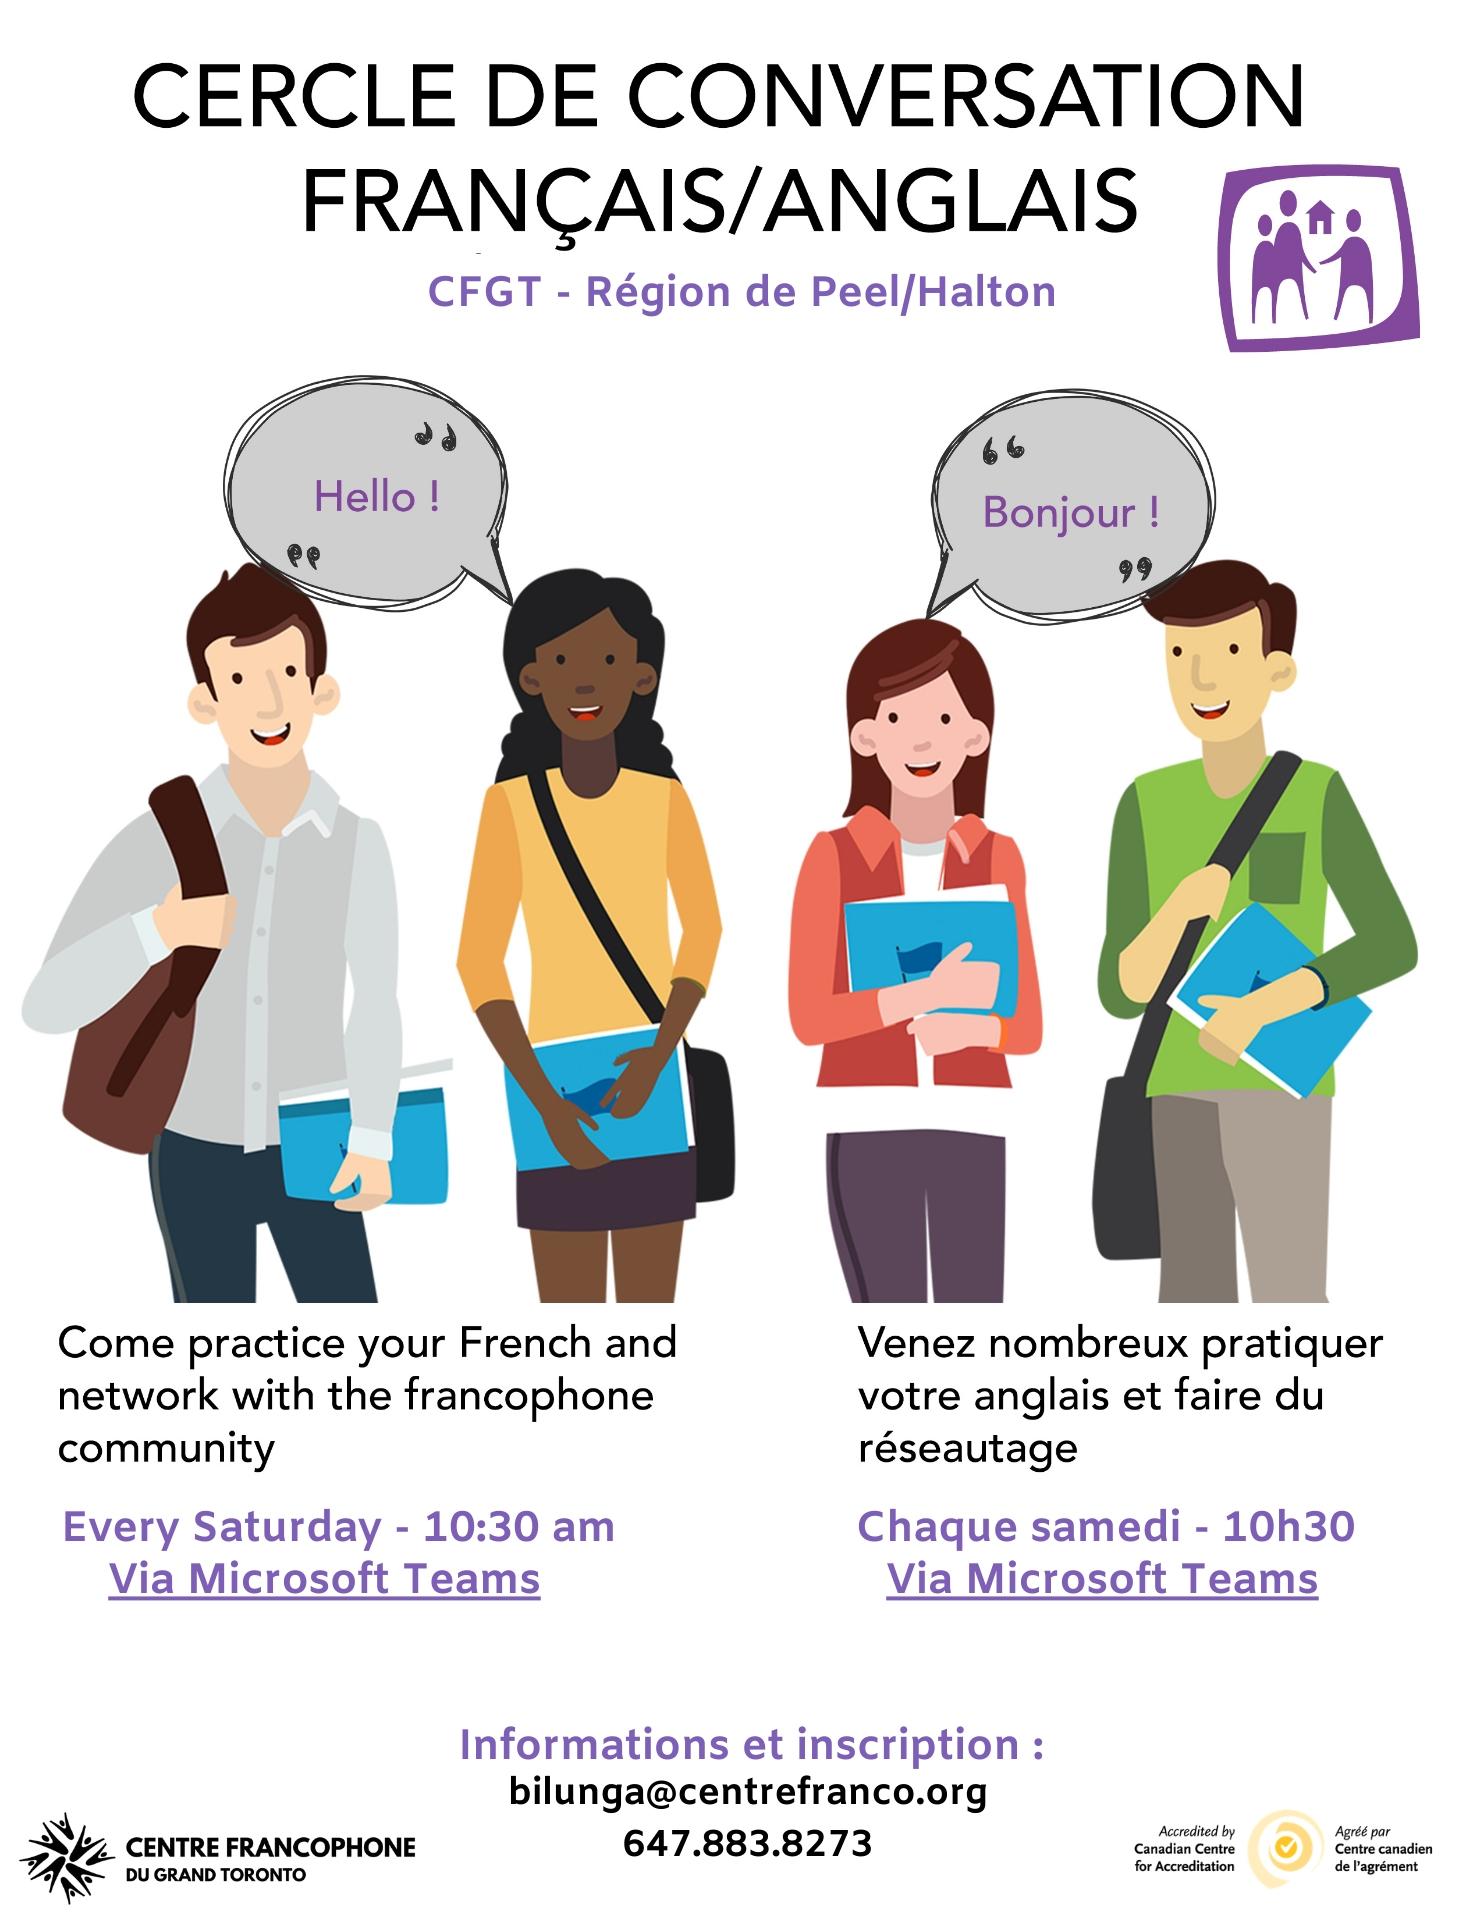 Cercle de conversation français / anglais (Peel/Halton)